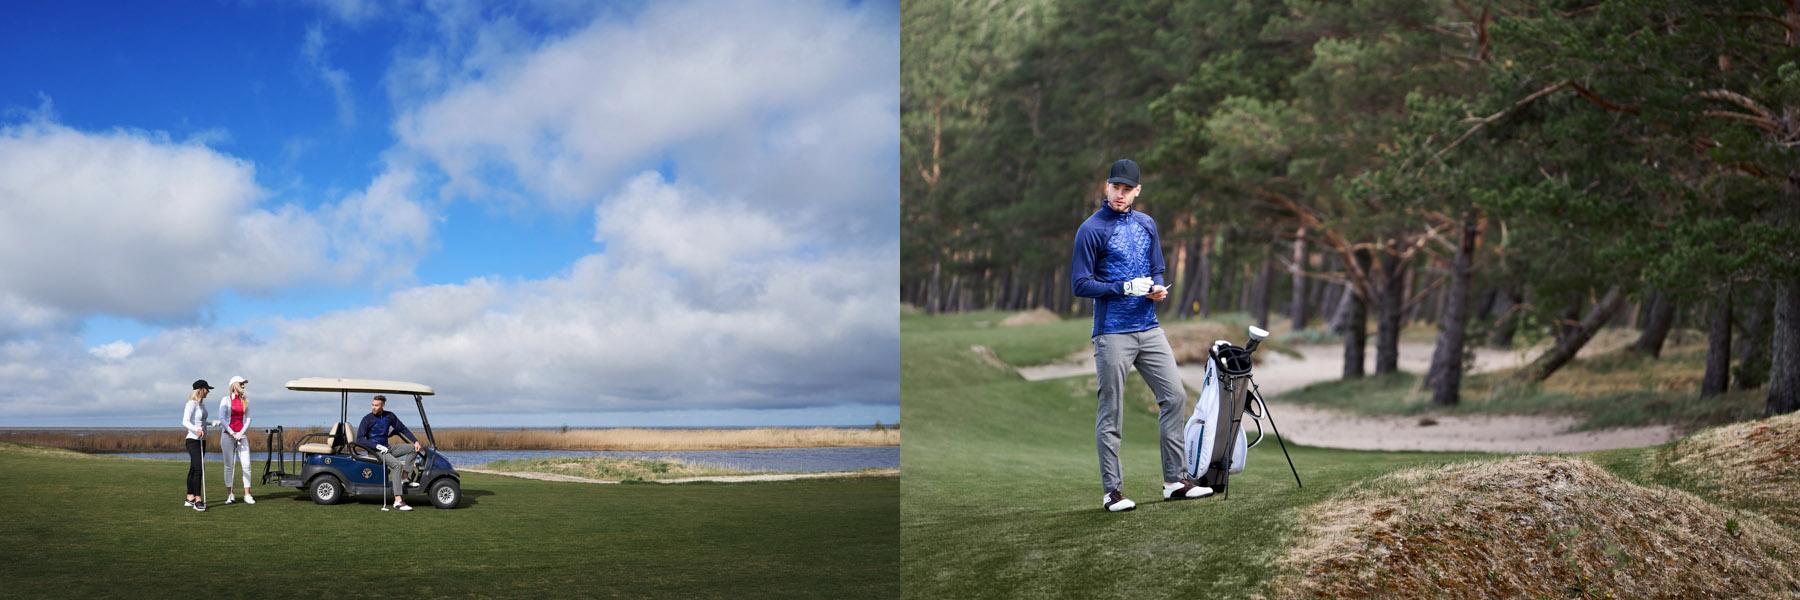 reklaamfotod fotograaf Kristian Kruuser sport golf fotograaf tallinnas-3.jpg